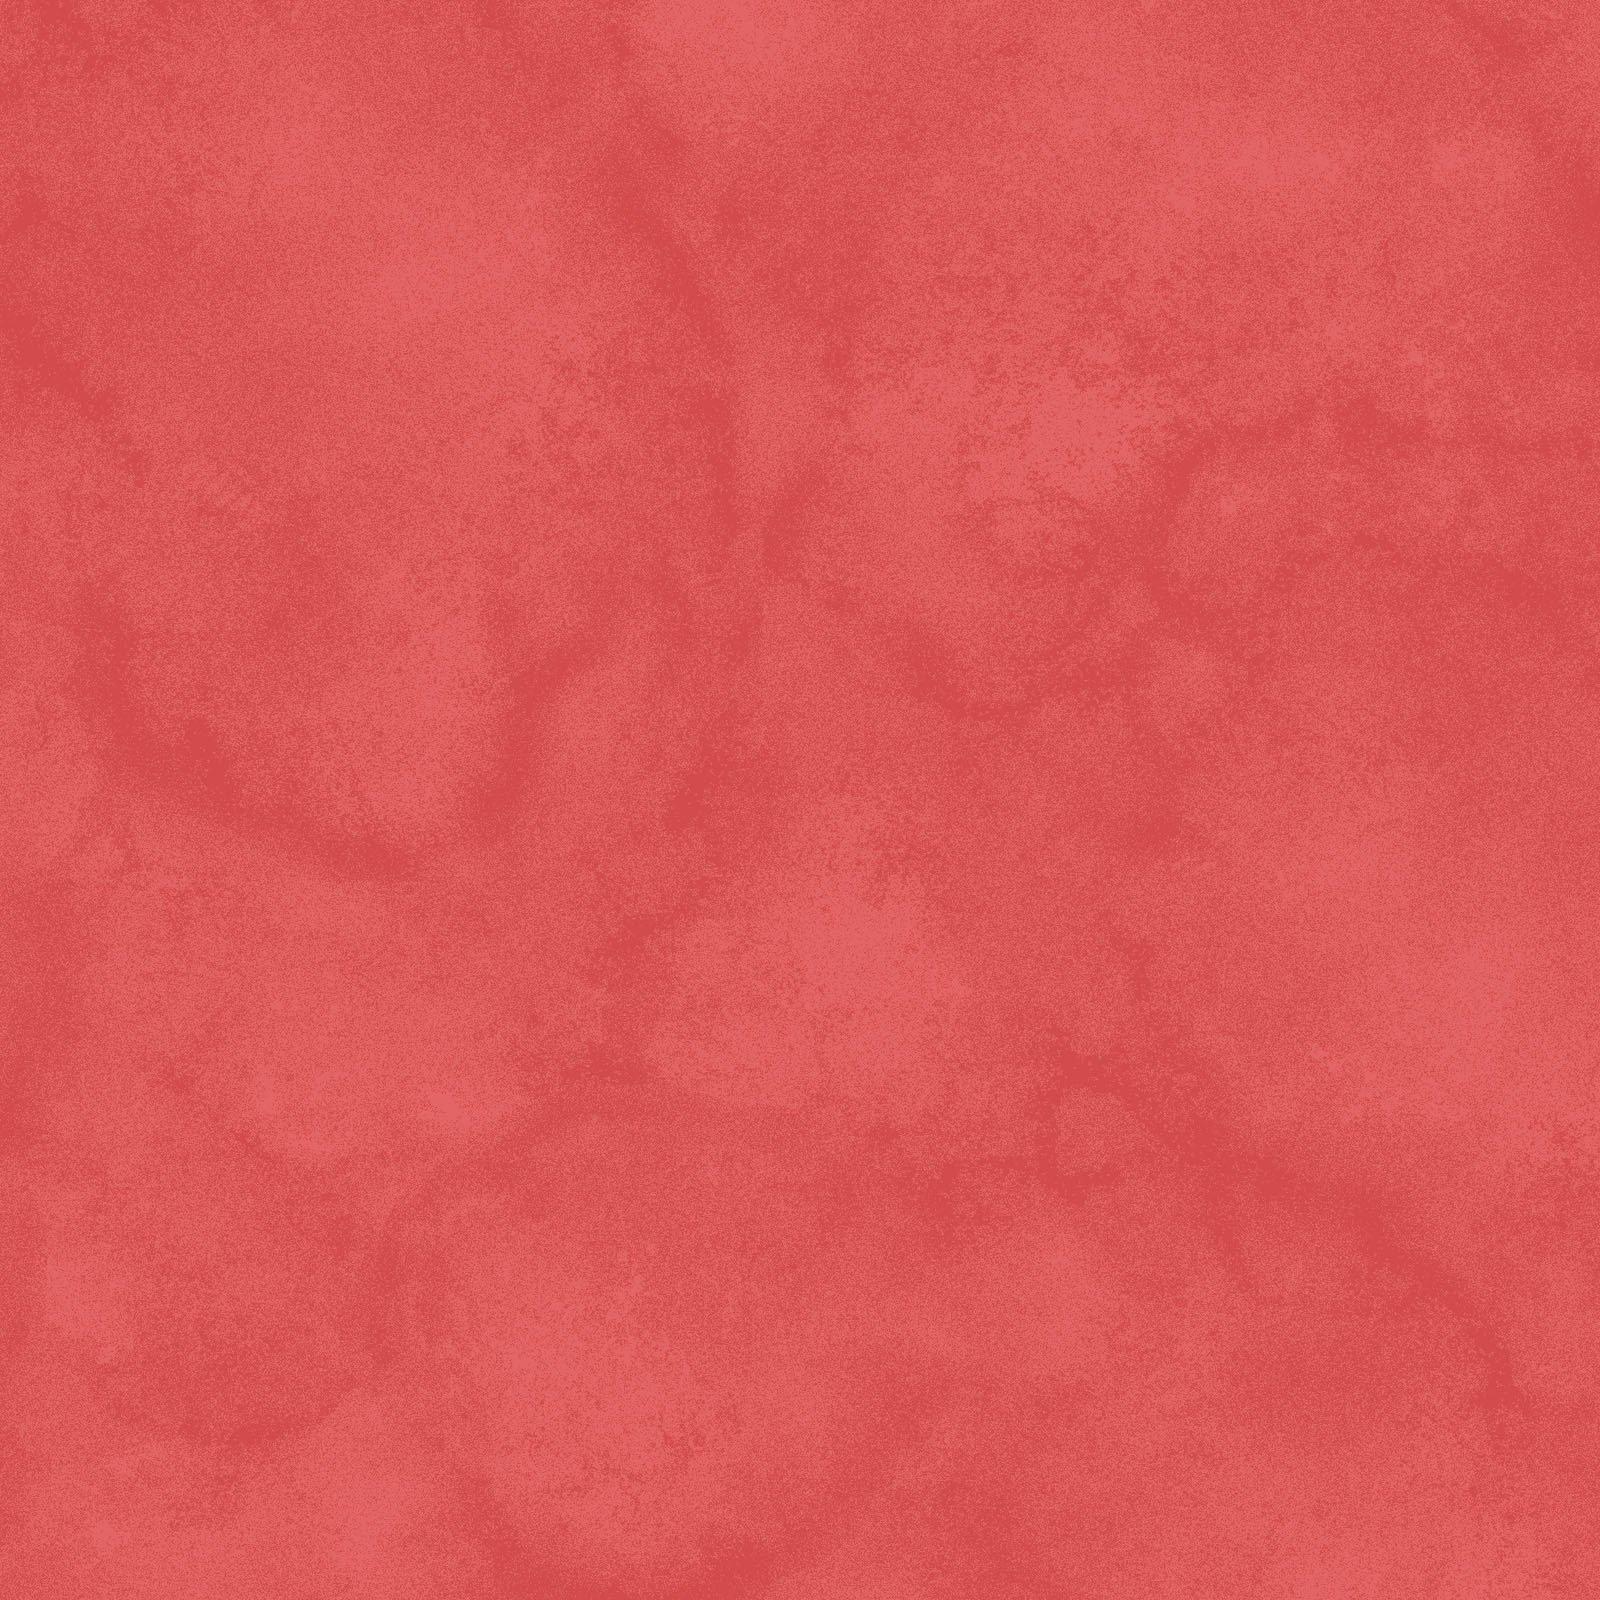 Colorwash - Soft Red<br/>Maywood Studio 8338-R2